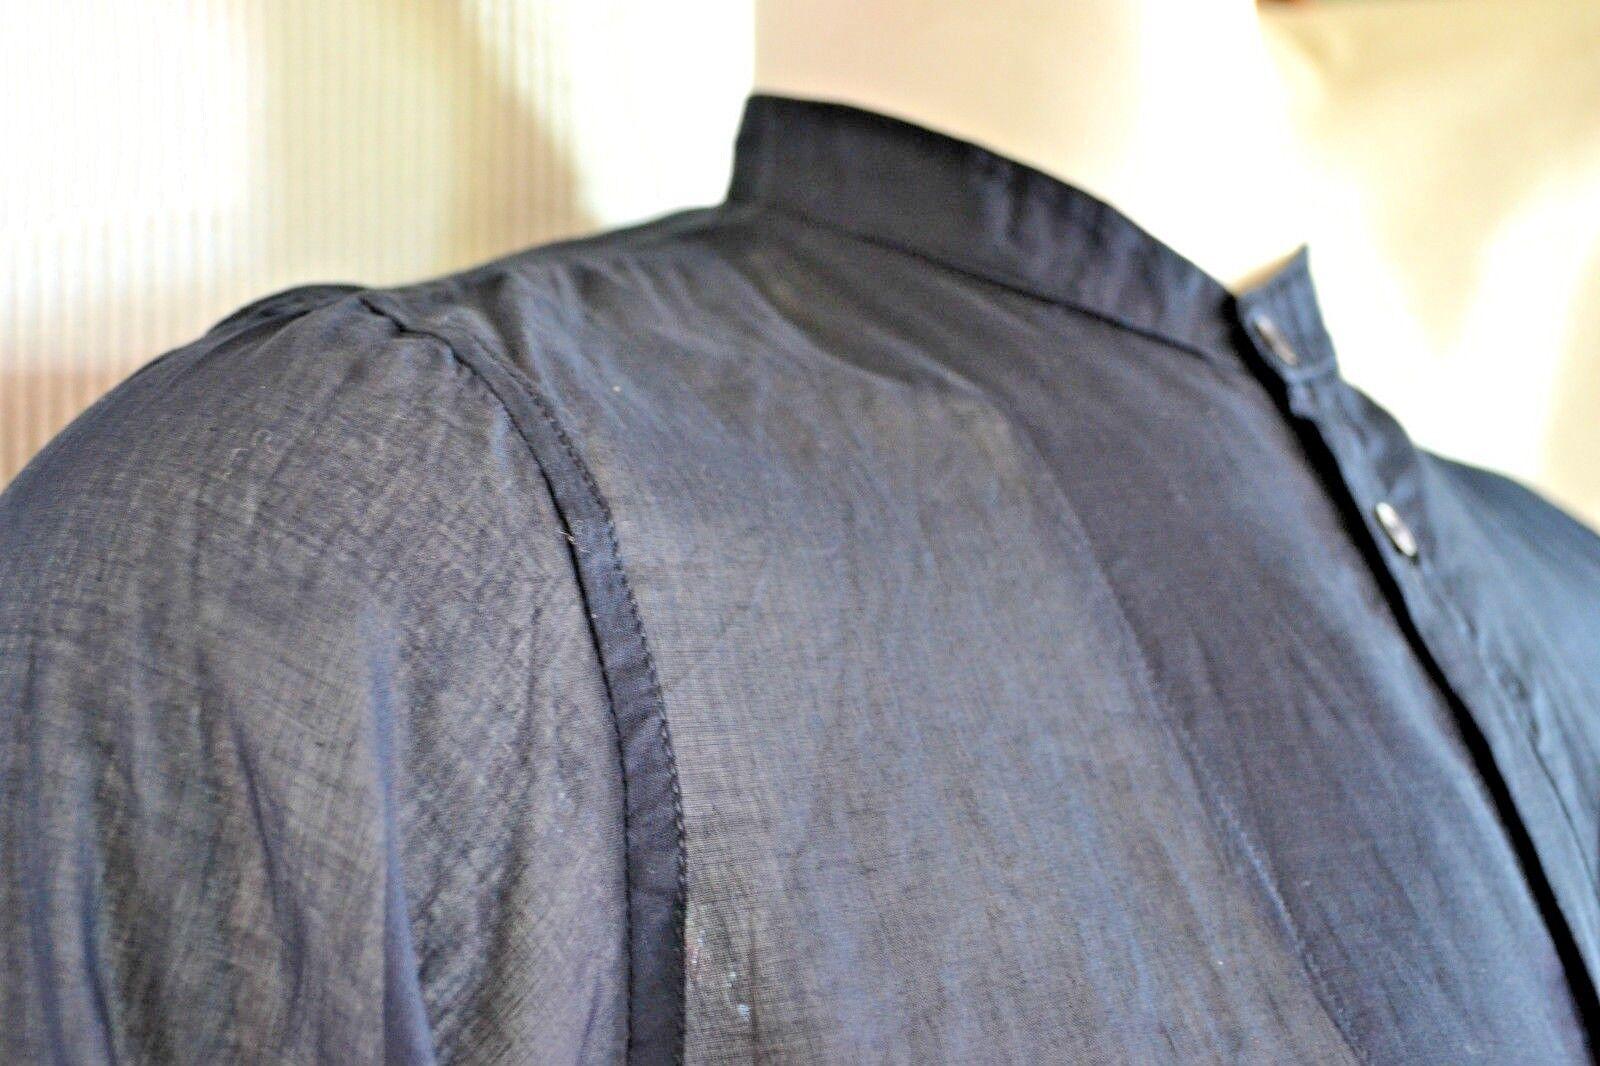 PRADA Herren Hemd men shirt chemise L 41 neu  NEW transparent Stehragen blau